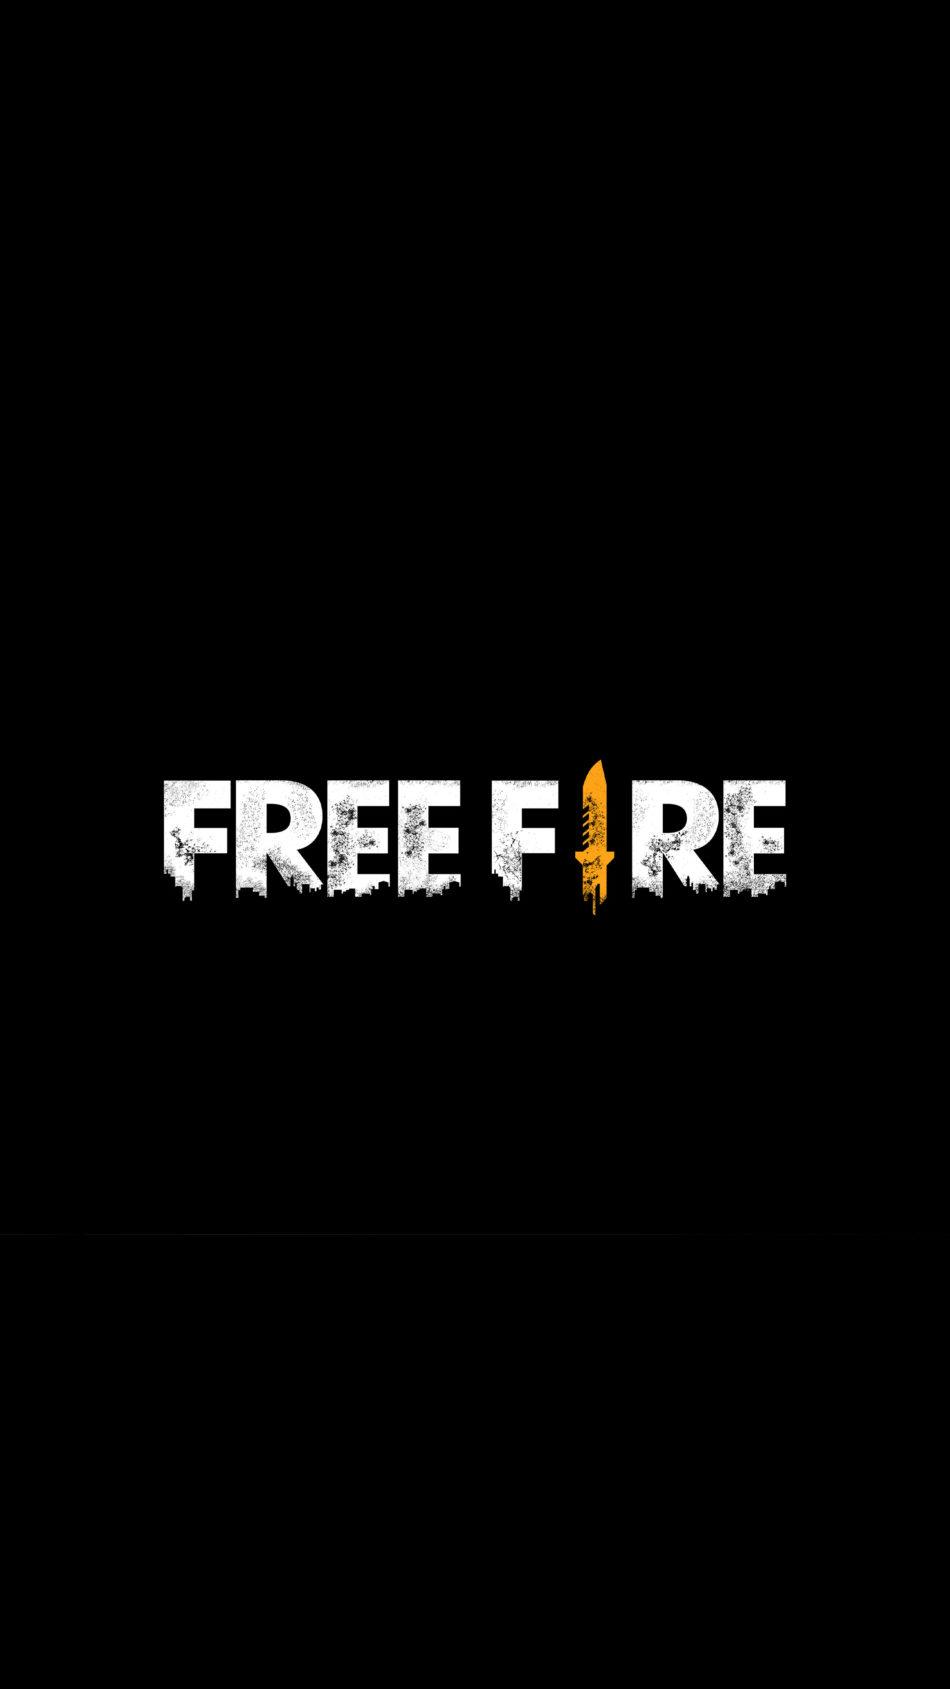 Free Fire Logo Dark Background 4K Ultra HD Mobile Wallpaper